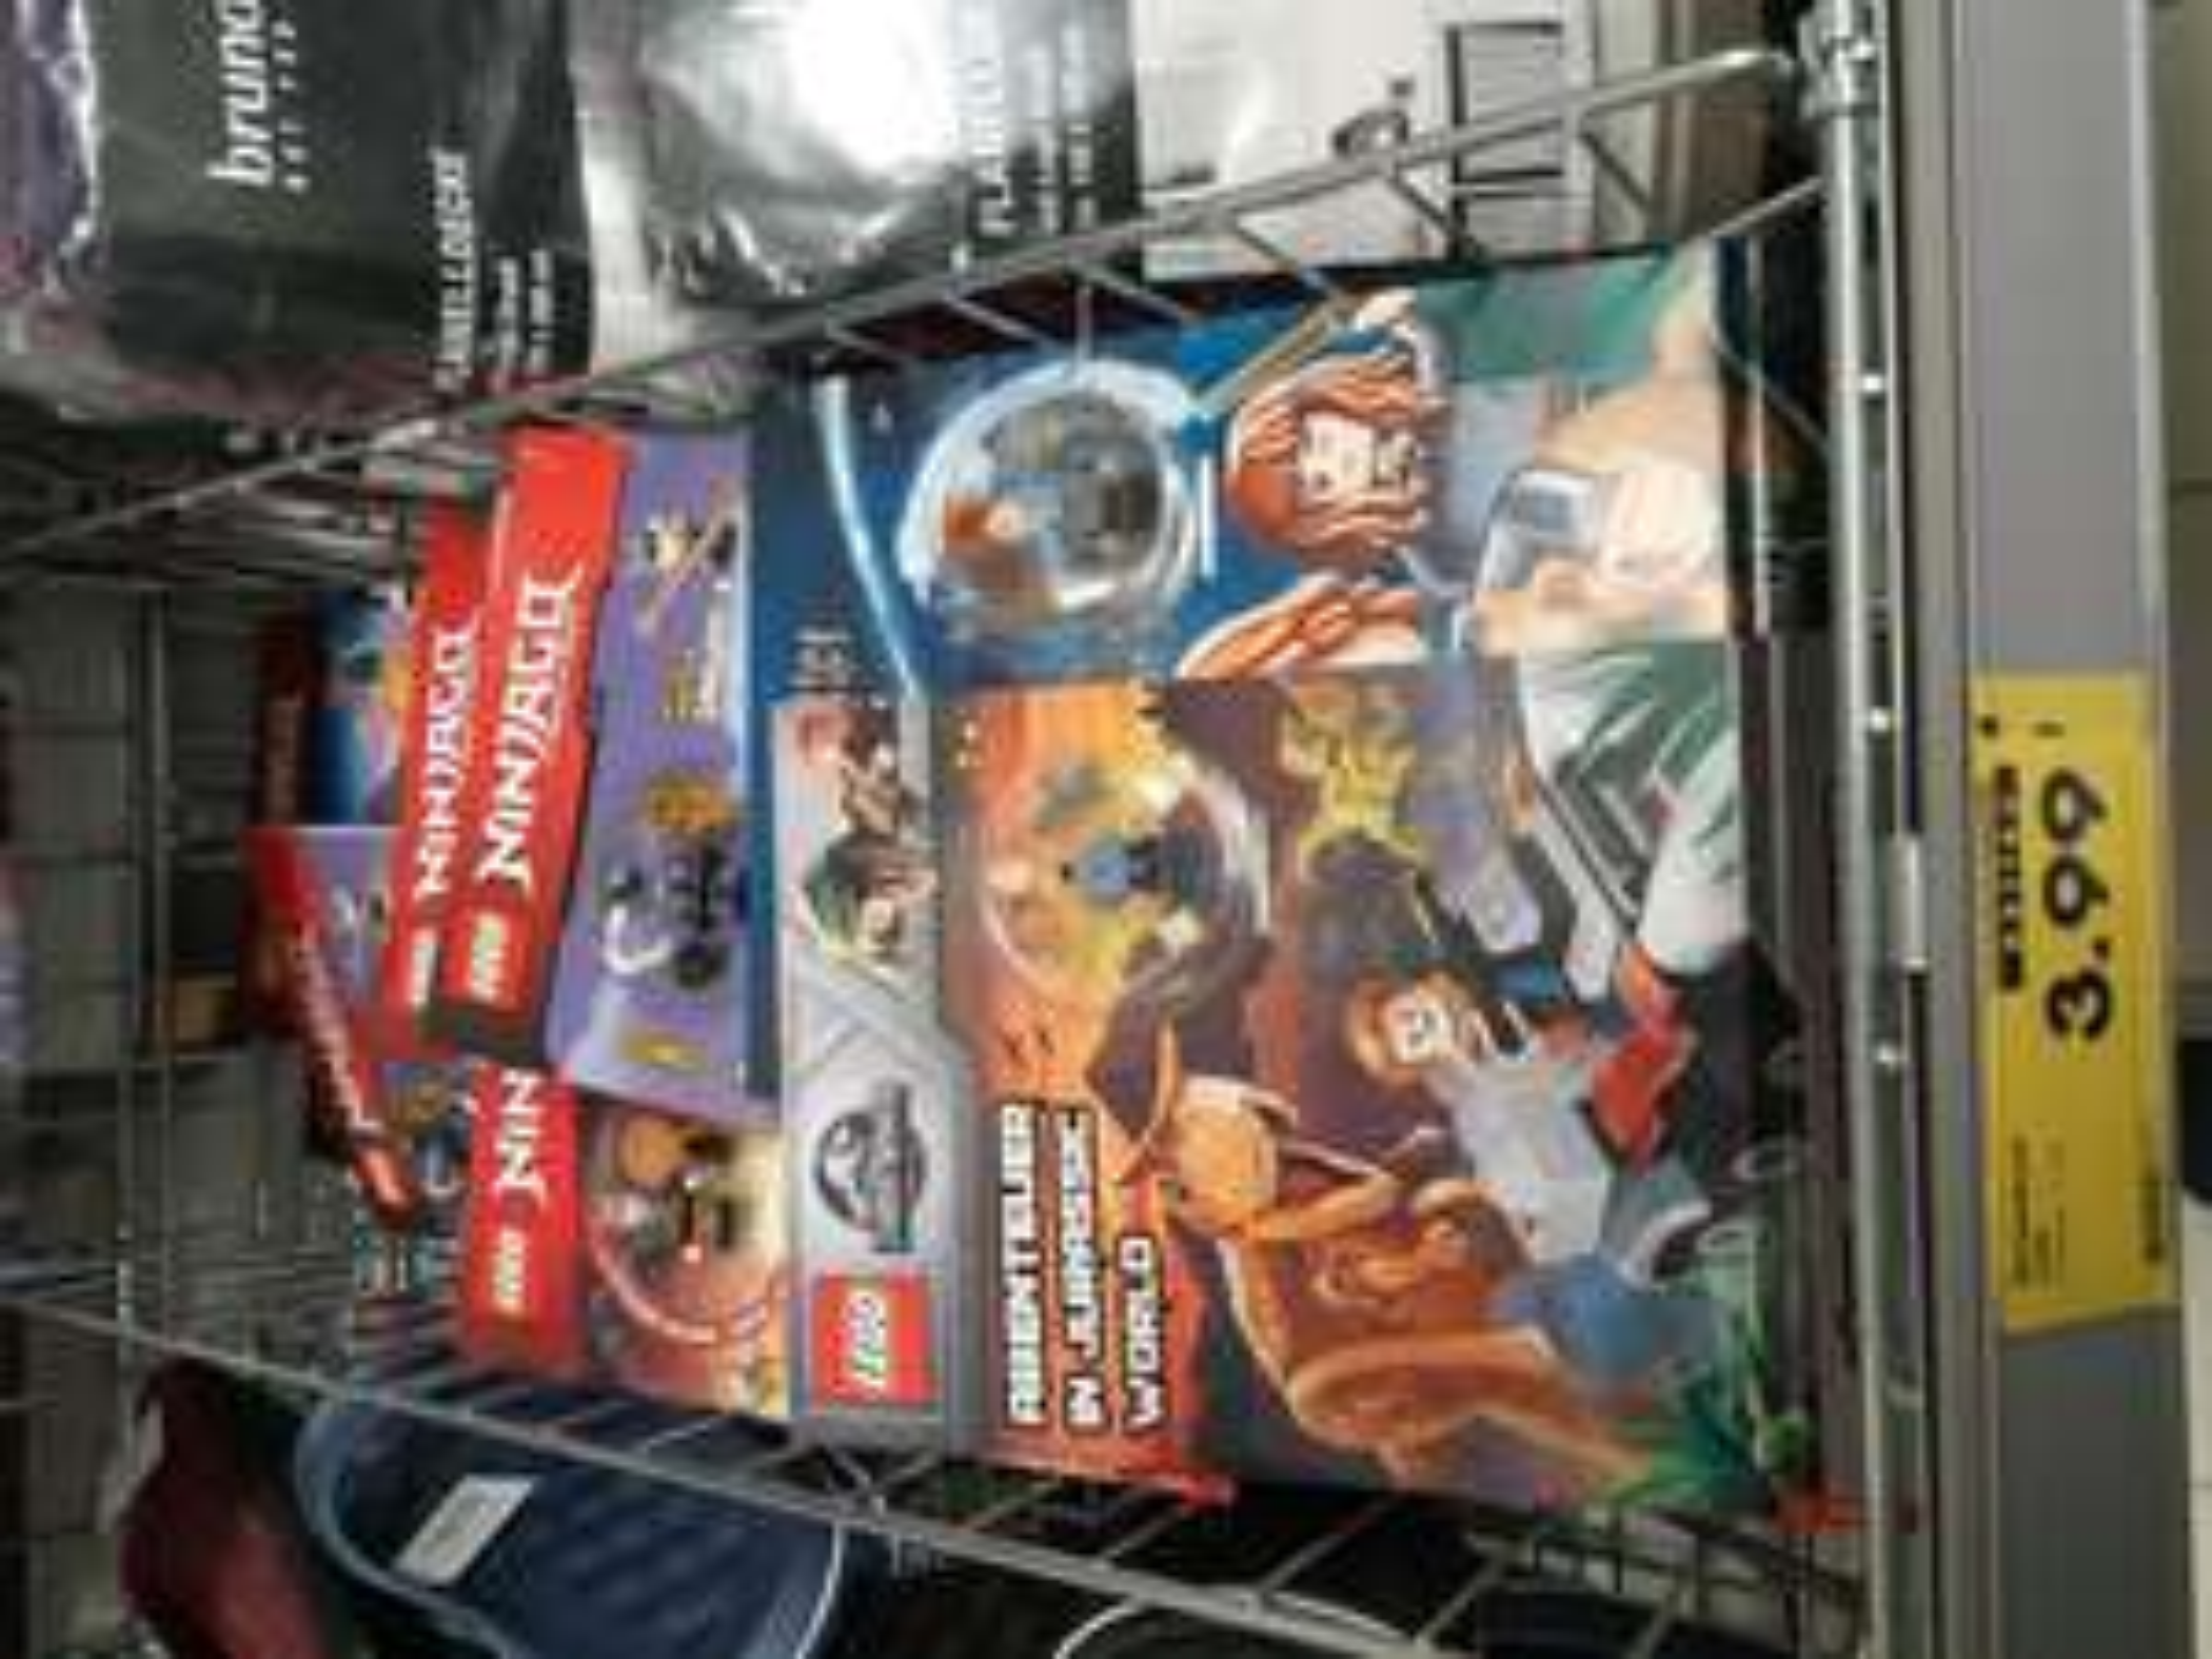 (netto,Thalia.de) Lego Heft mit Minifigur